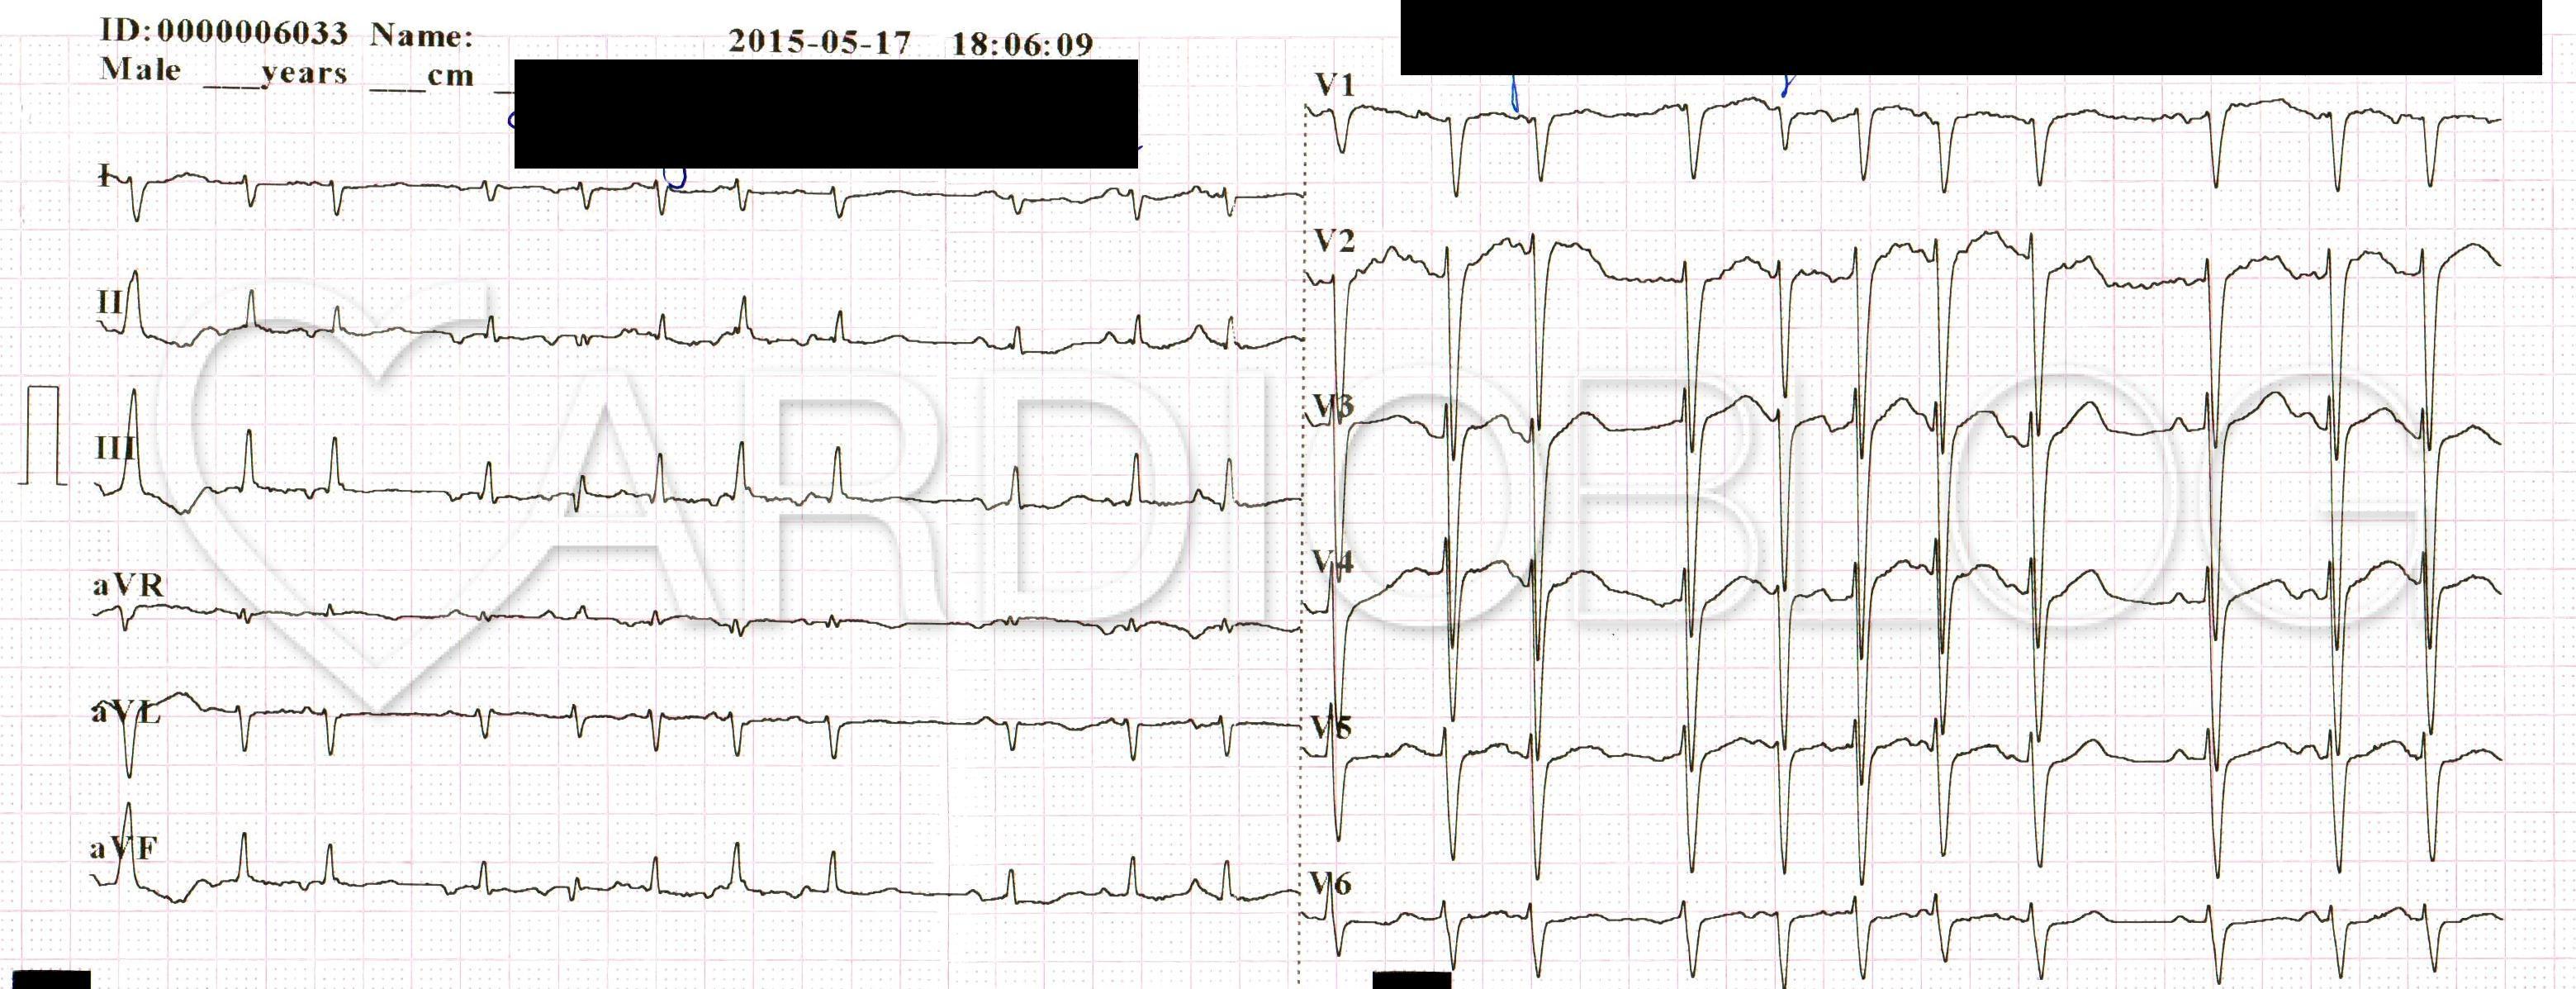 Mi a szív sinus ritmusa?